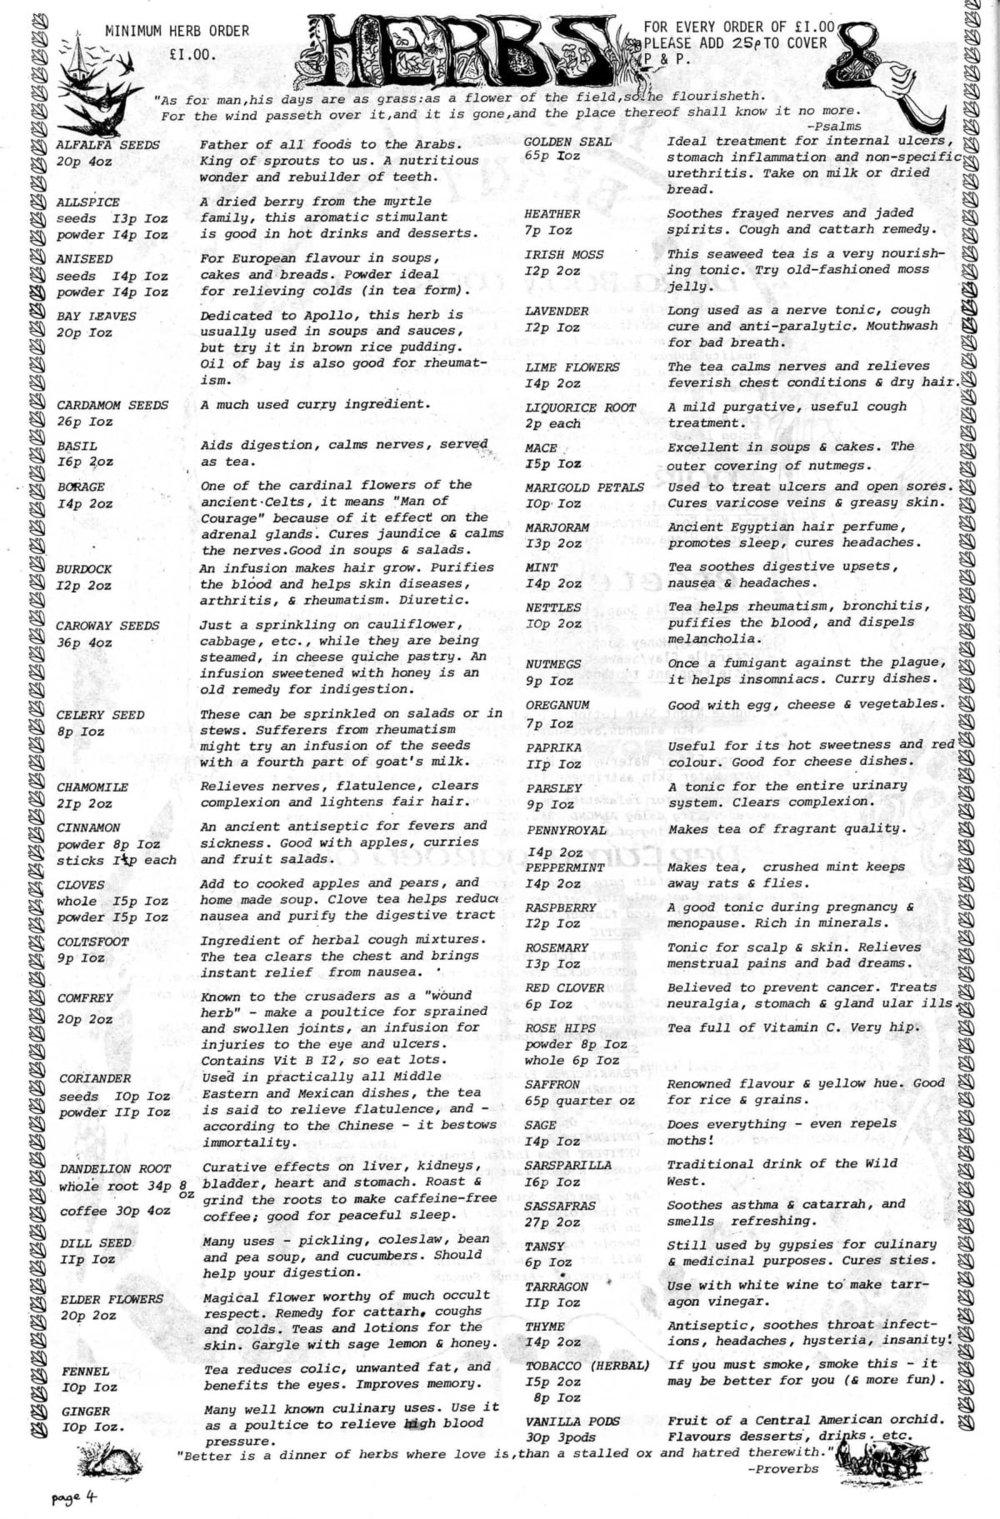 seed-v2-n10-oct1973-19.jpg